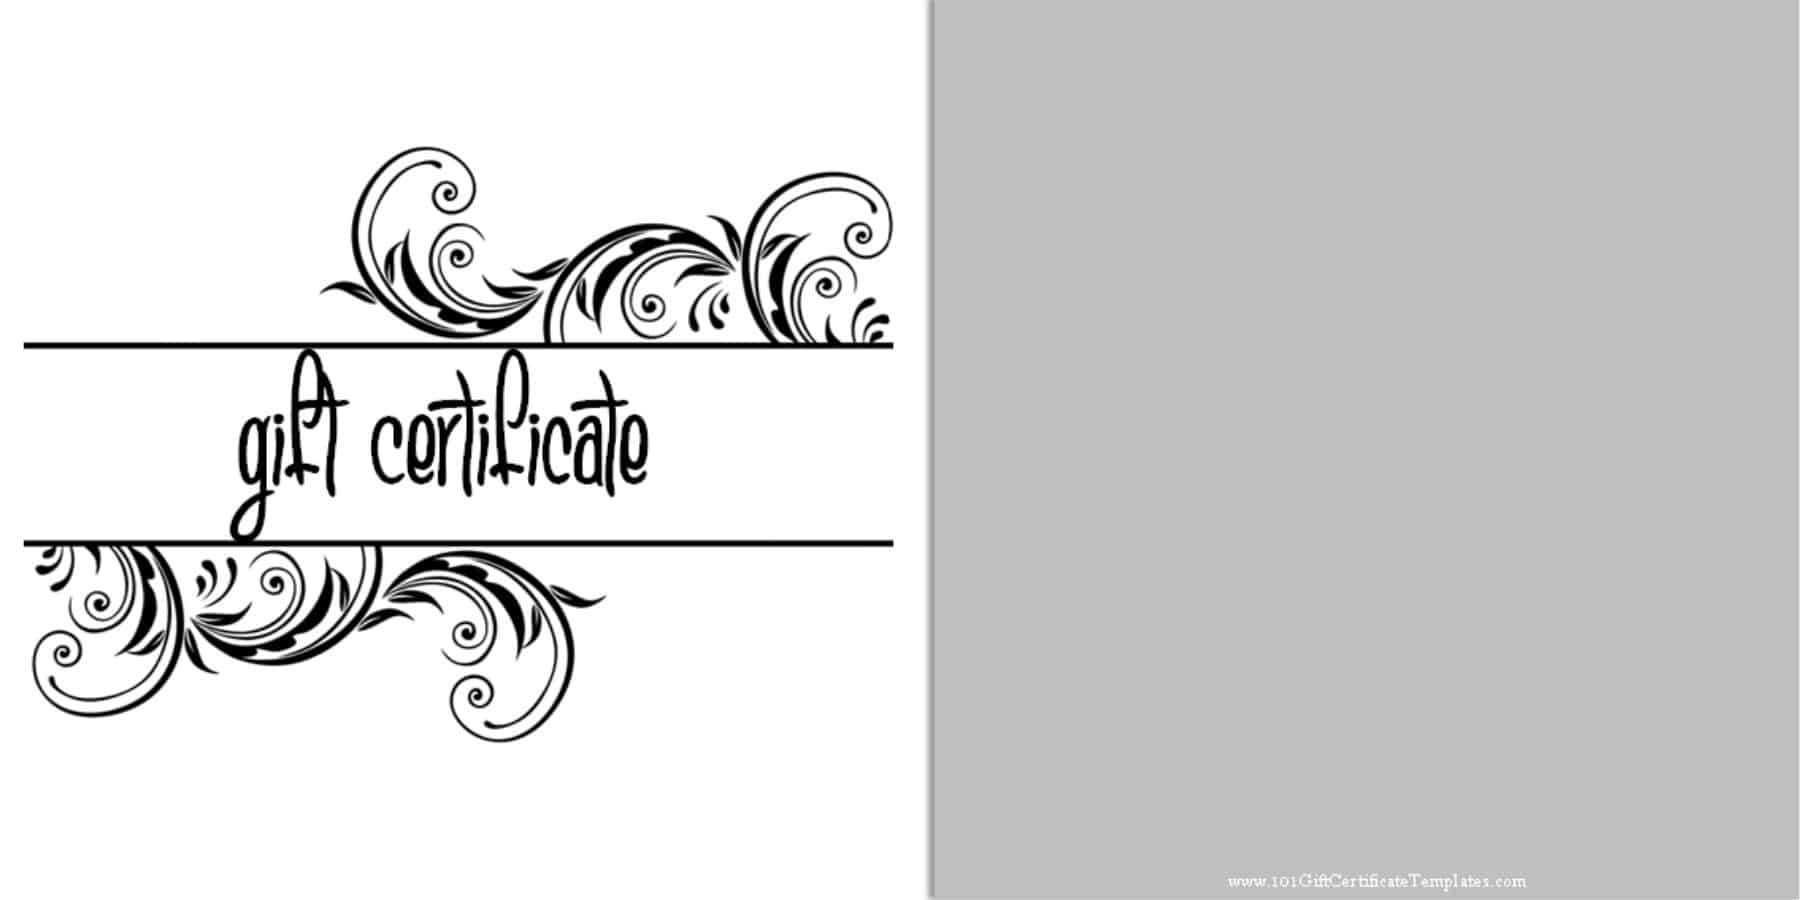 Printable Gift Certificate Templates regarding Black And White Gift Certificate Template Free